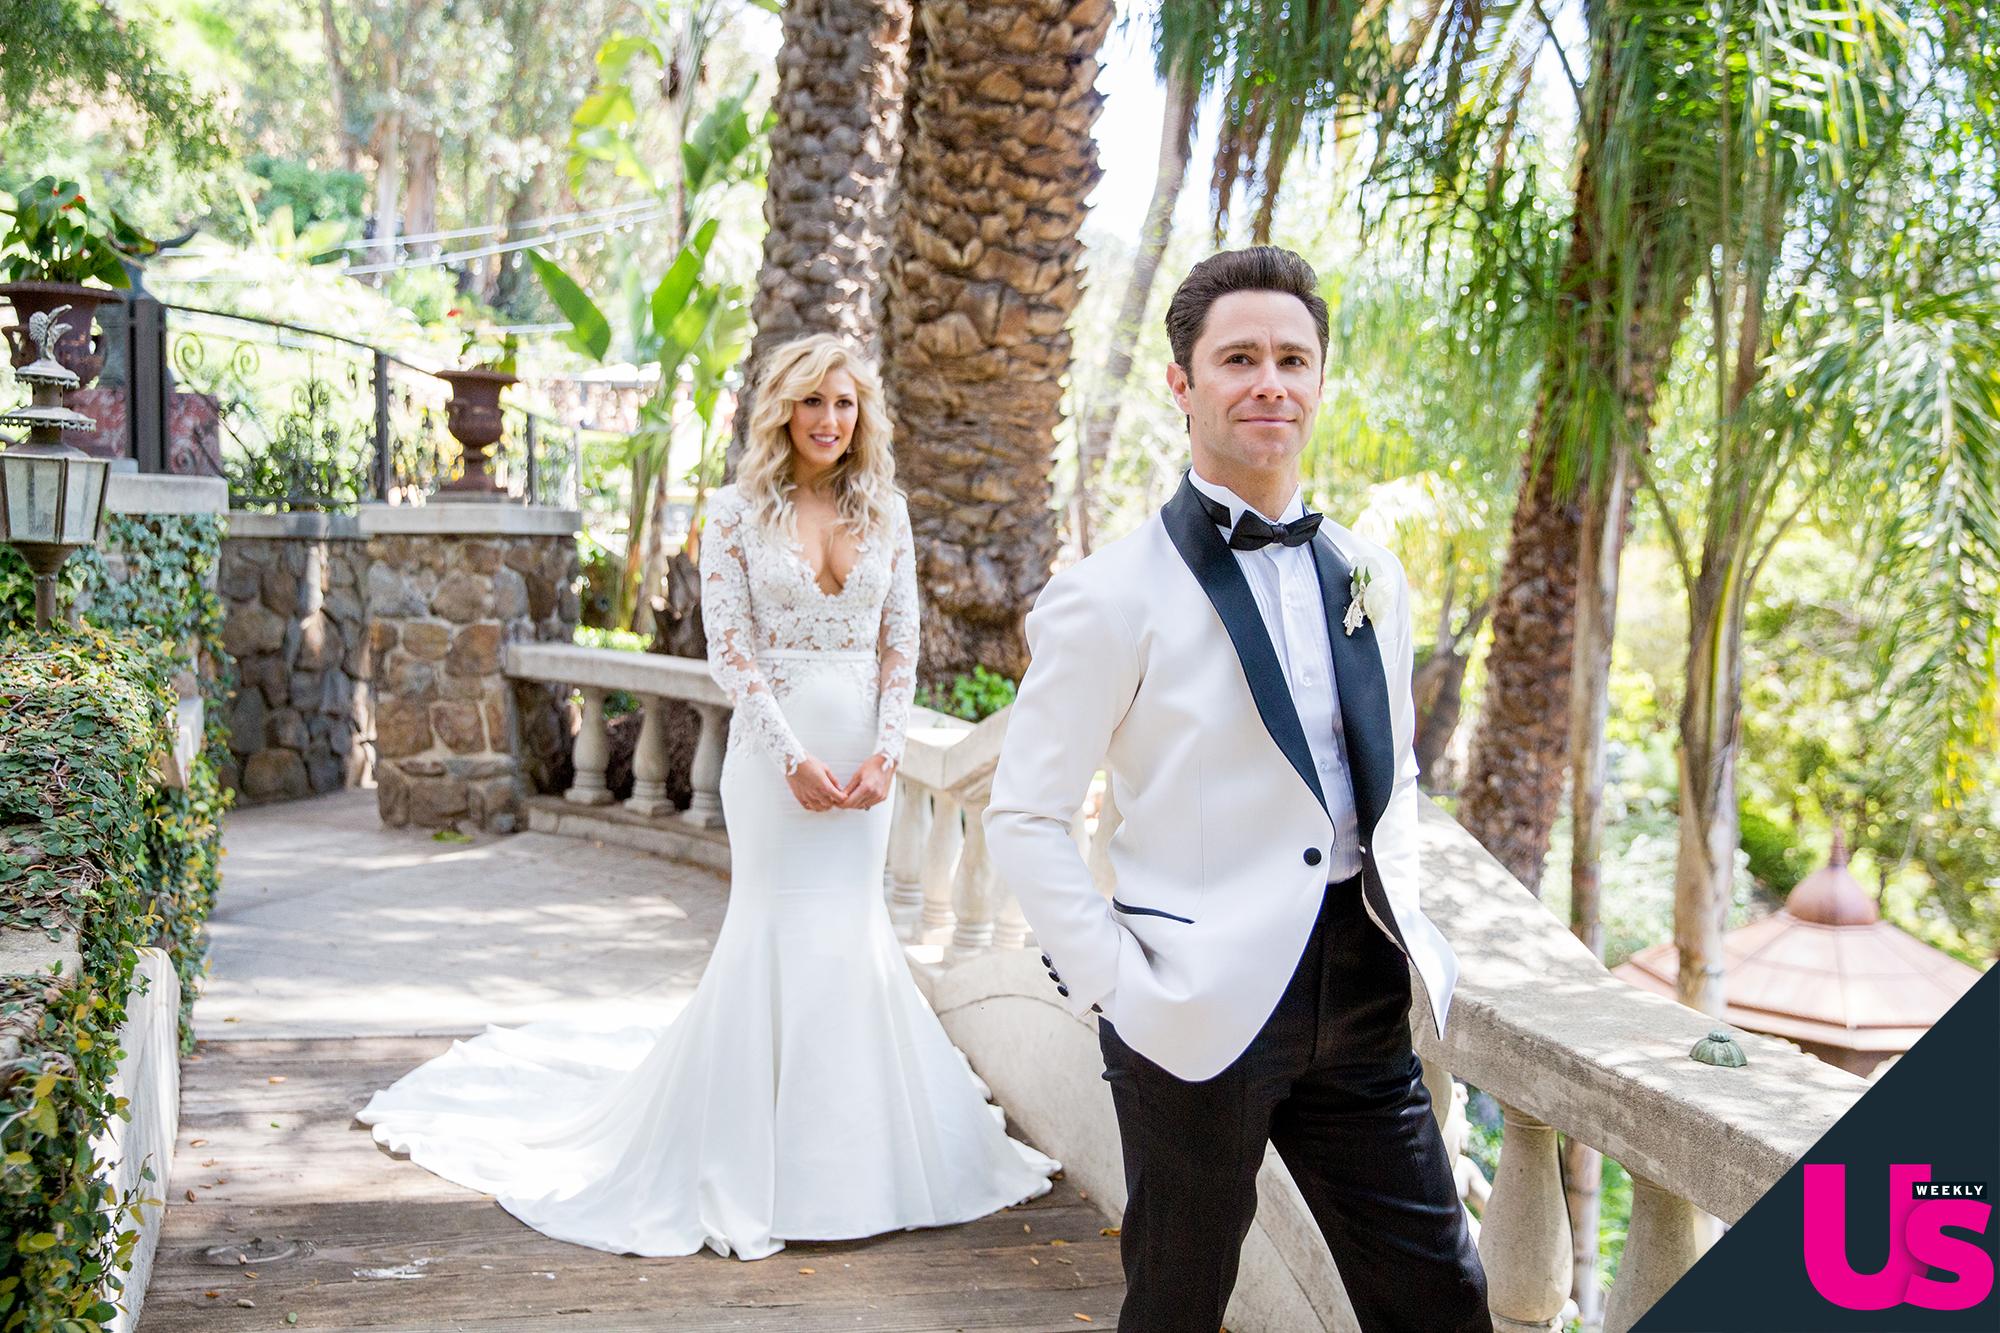 DWTS' Pros Emma Slater and Sasha Farber's Wedding Album